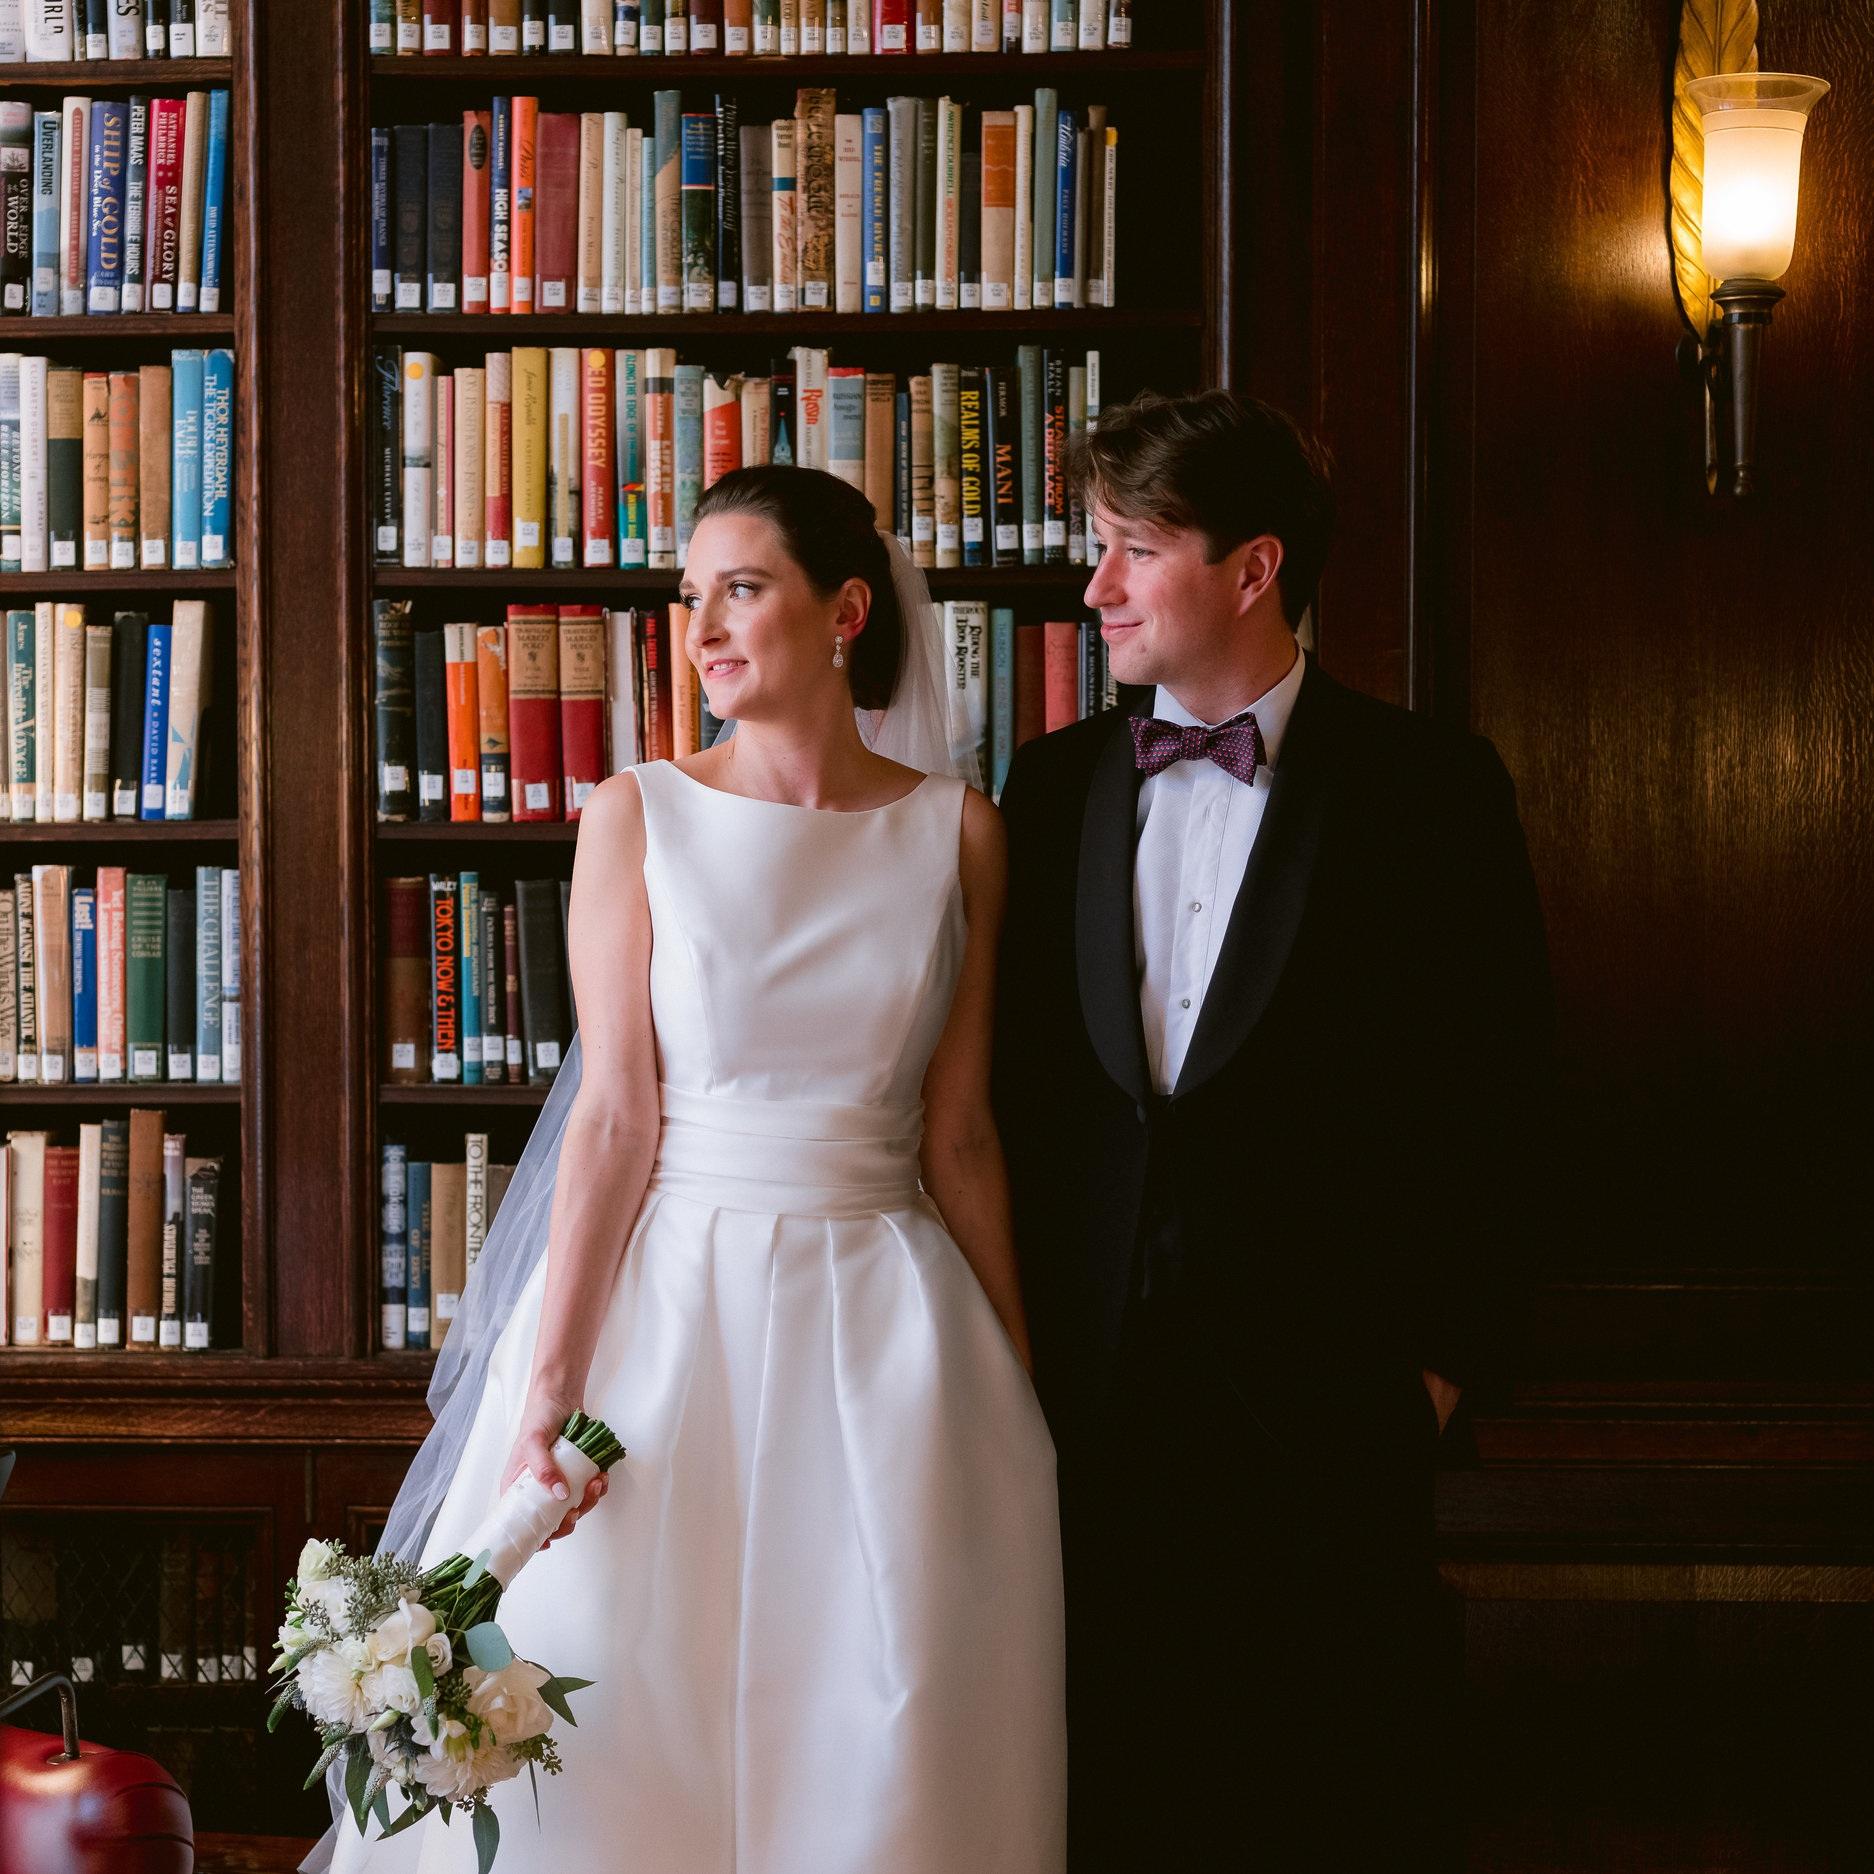 Hermione & Will's wedding